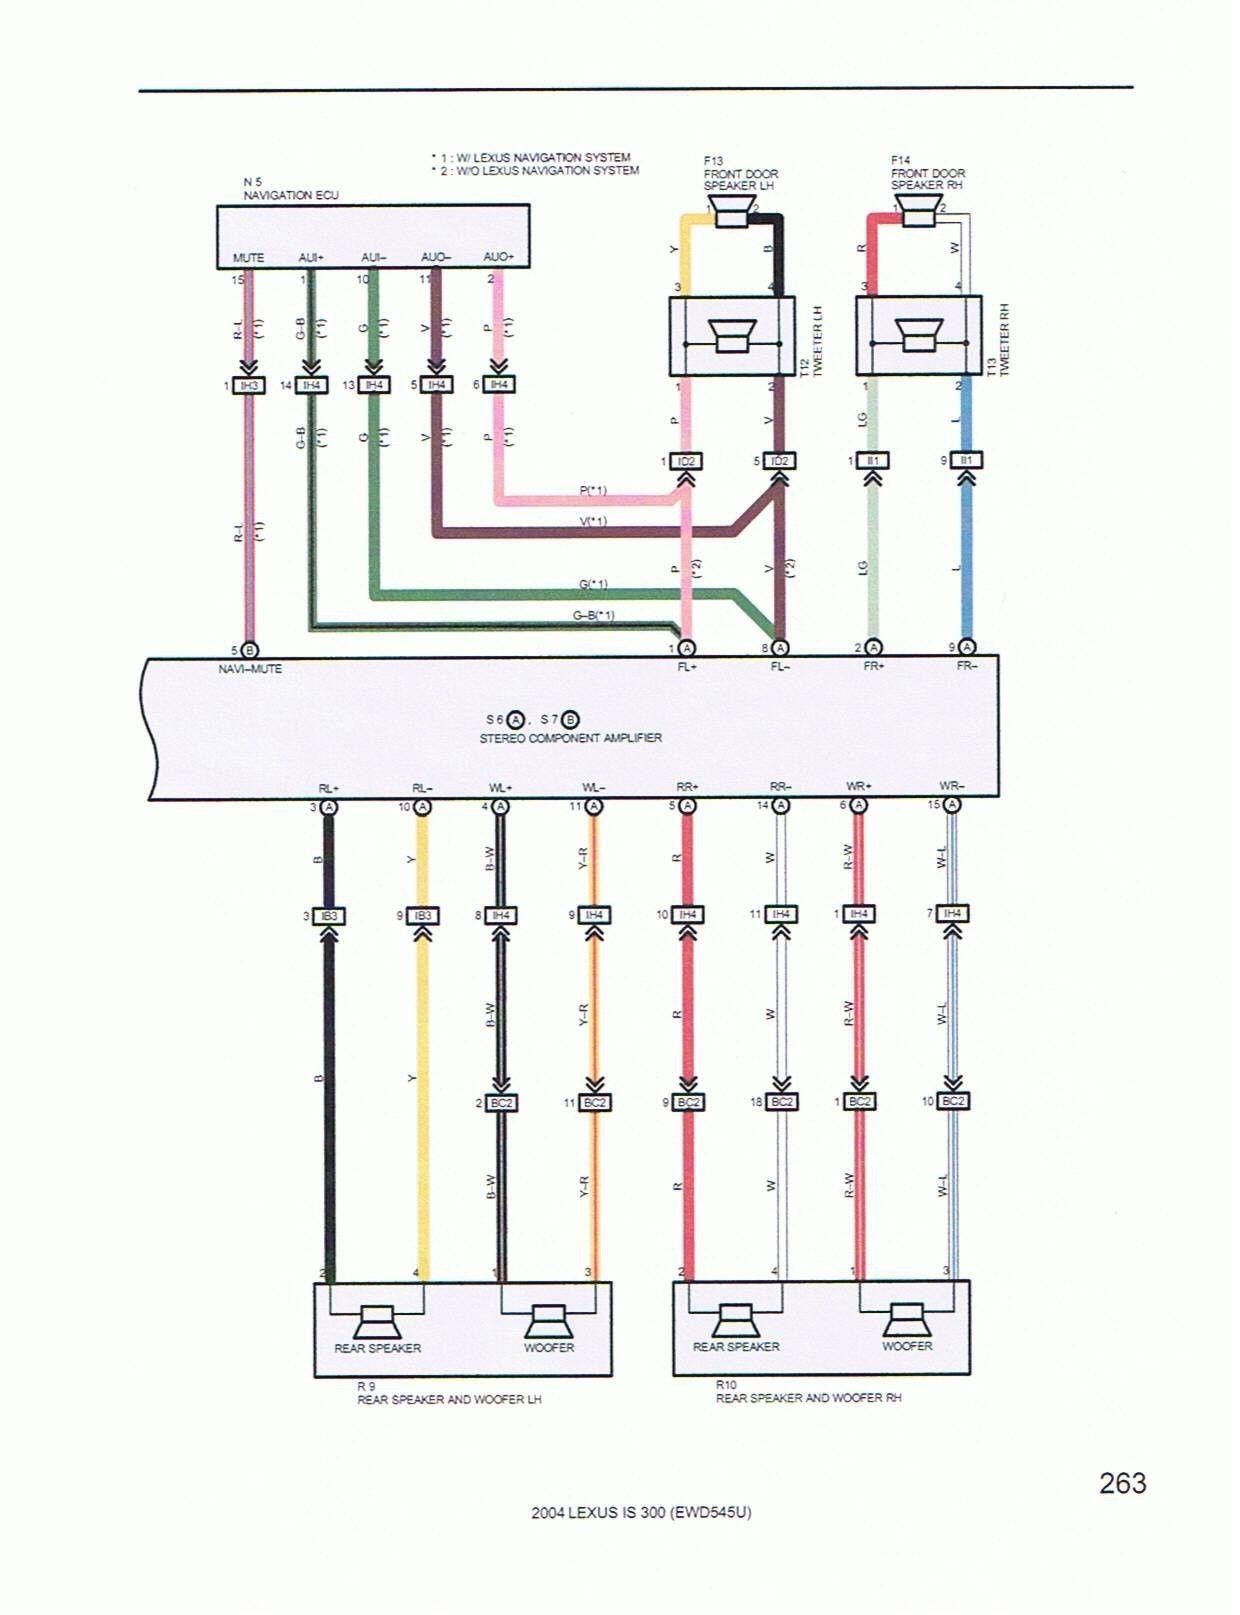 head unit wiring diagram 2001 camaro new golf 4 1 9 tdi wiring diagram diagram diagramsample  golf 4 1 9 tdi wiring diagram diagram